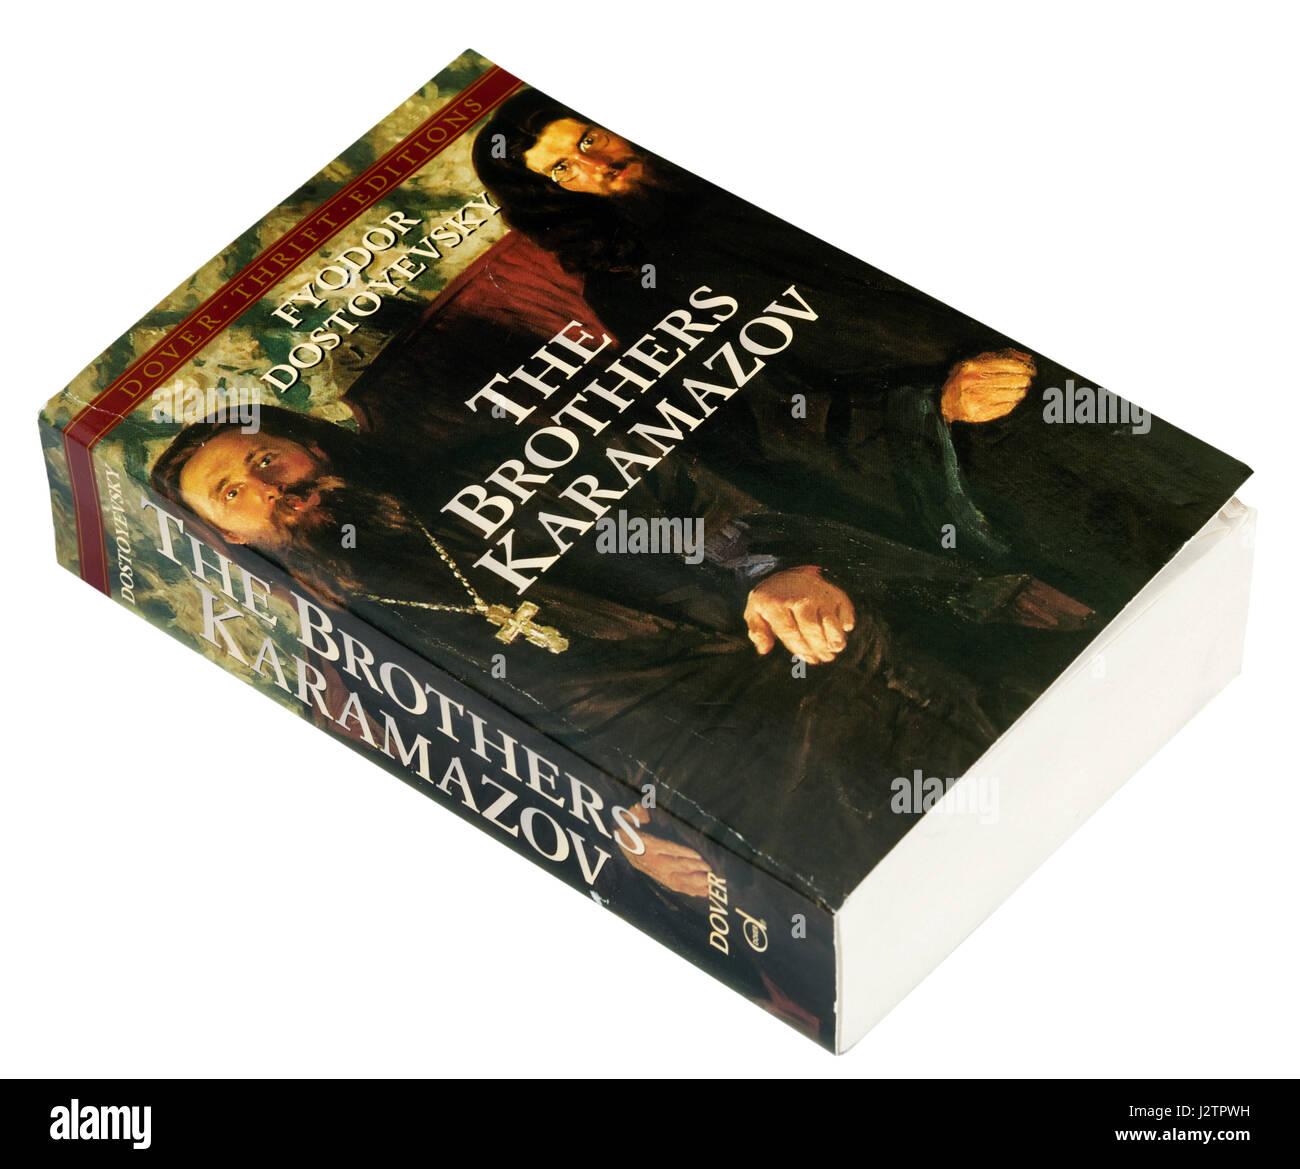 The Brothers Karamazov by Fyodr Dostoyevsky - Stock Image